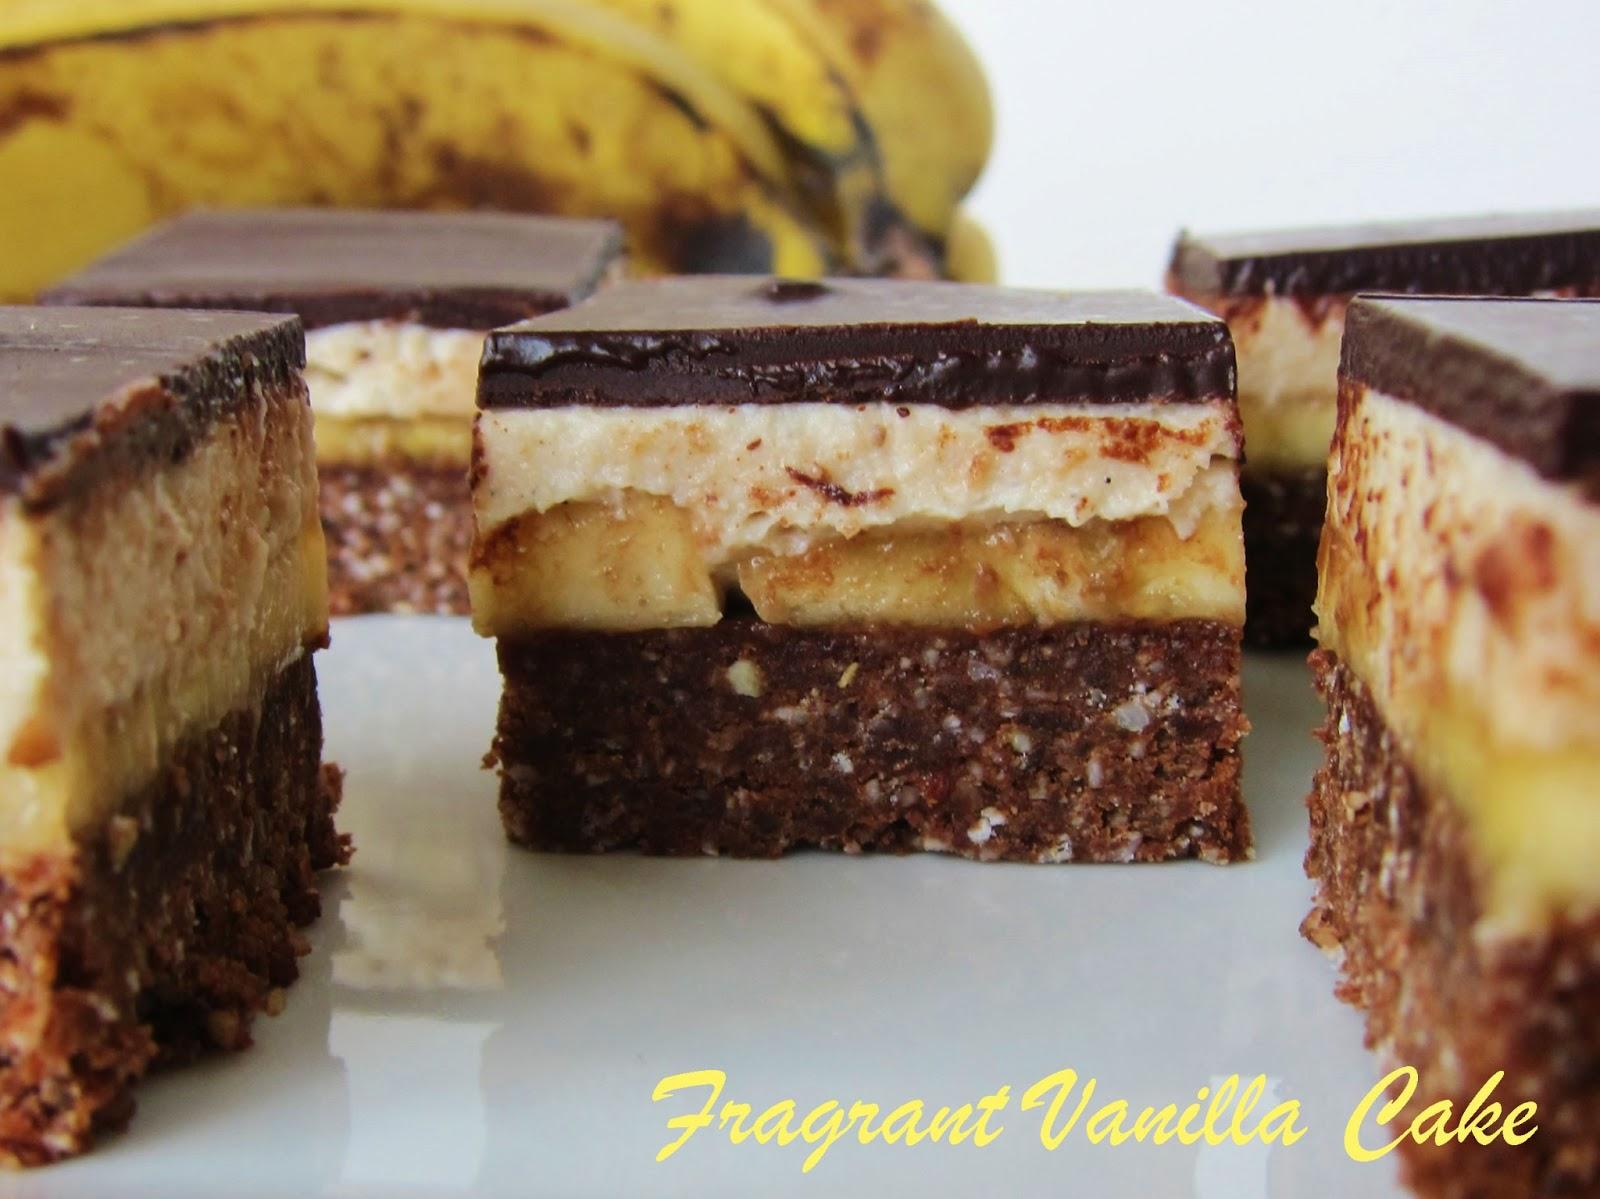 ... cake banana coconut sesame cake sticky rice cakes with banana